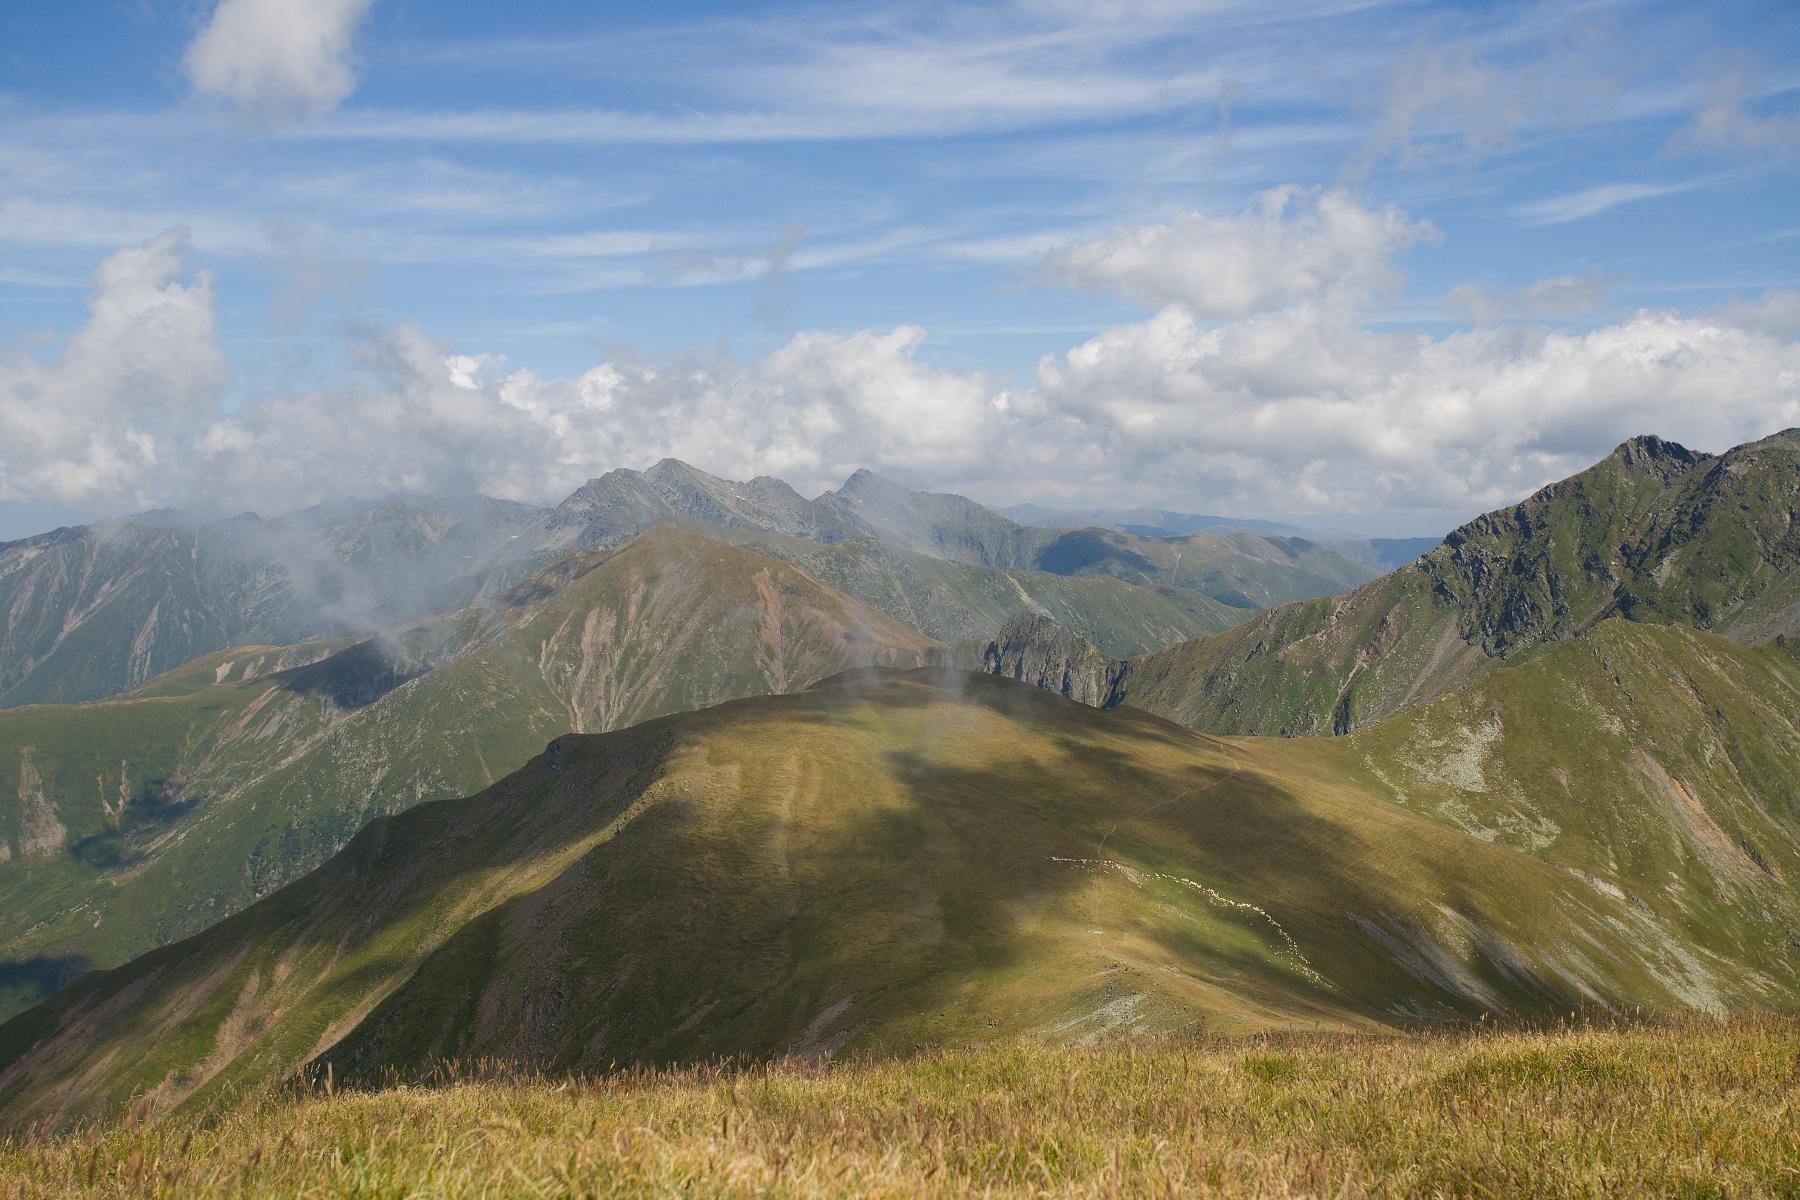 Budislavu peak, Munții Făgăraș, Romania Canon EOS 6D mark II, Canon 17-40 mm, 40 mm, f9, 1_500, ISO 160, 10. august 2019